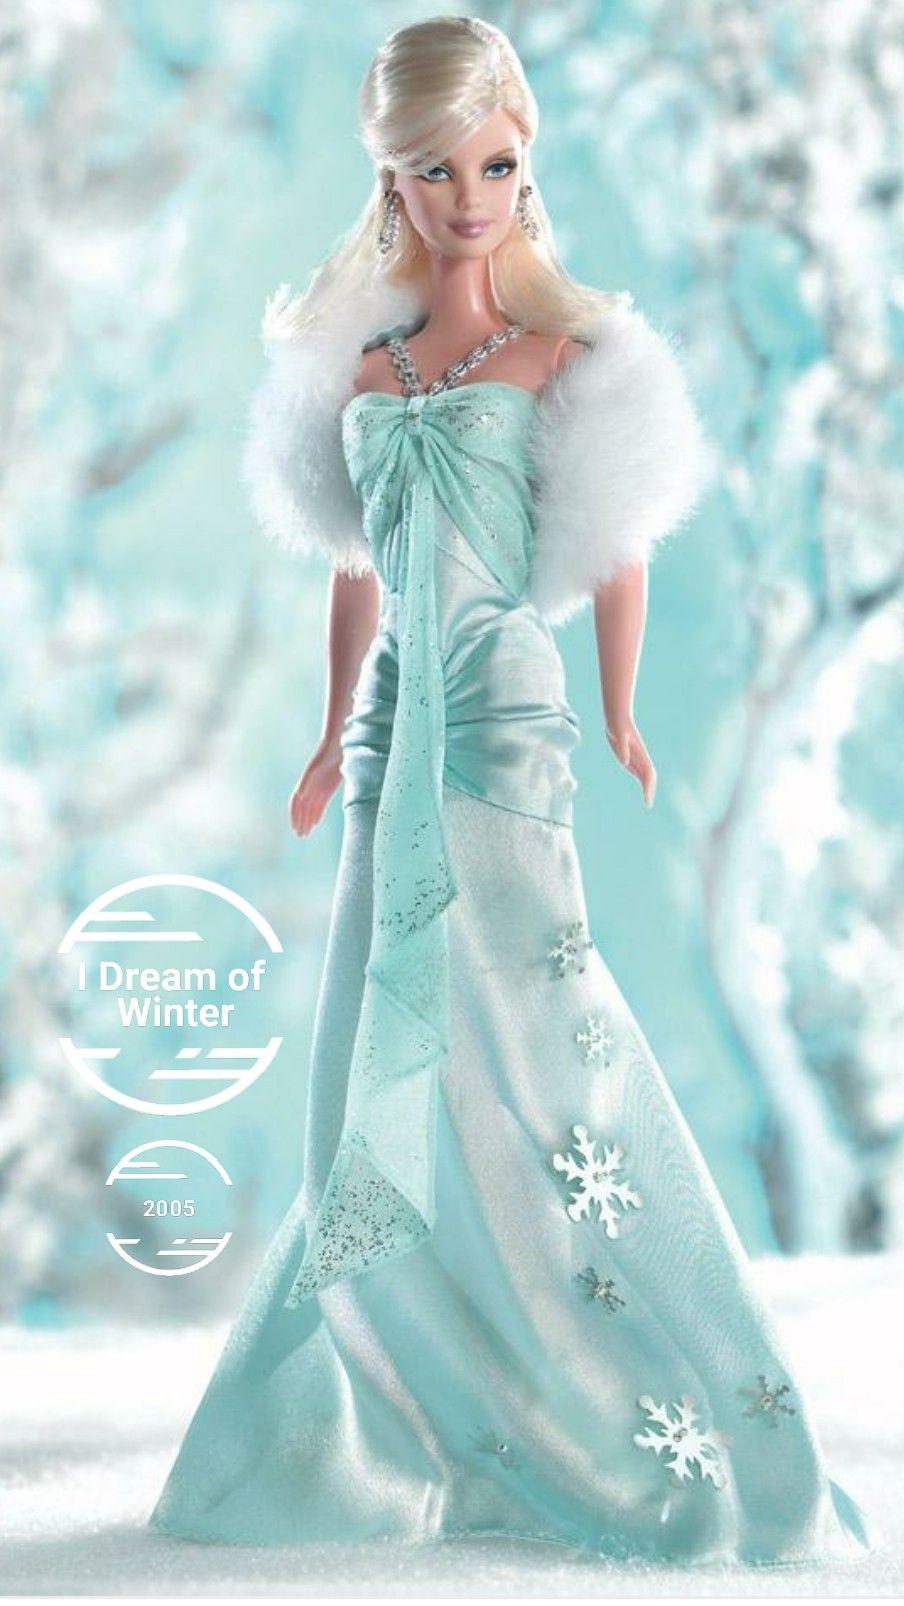 Pin de Damaris Fuentes en muñecas y barbies | Pinterest | Barbie ...